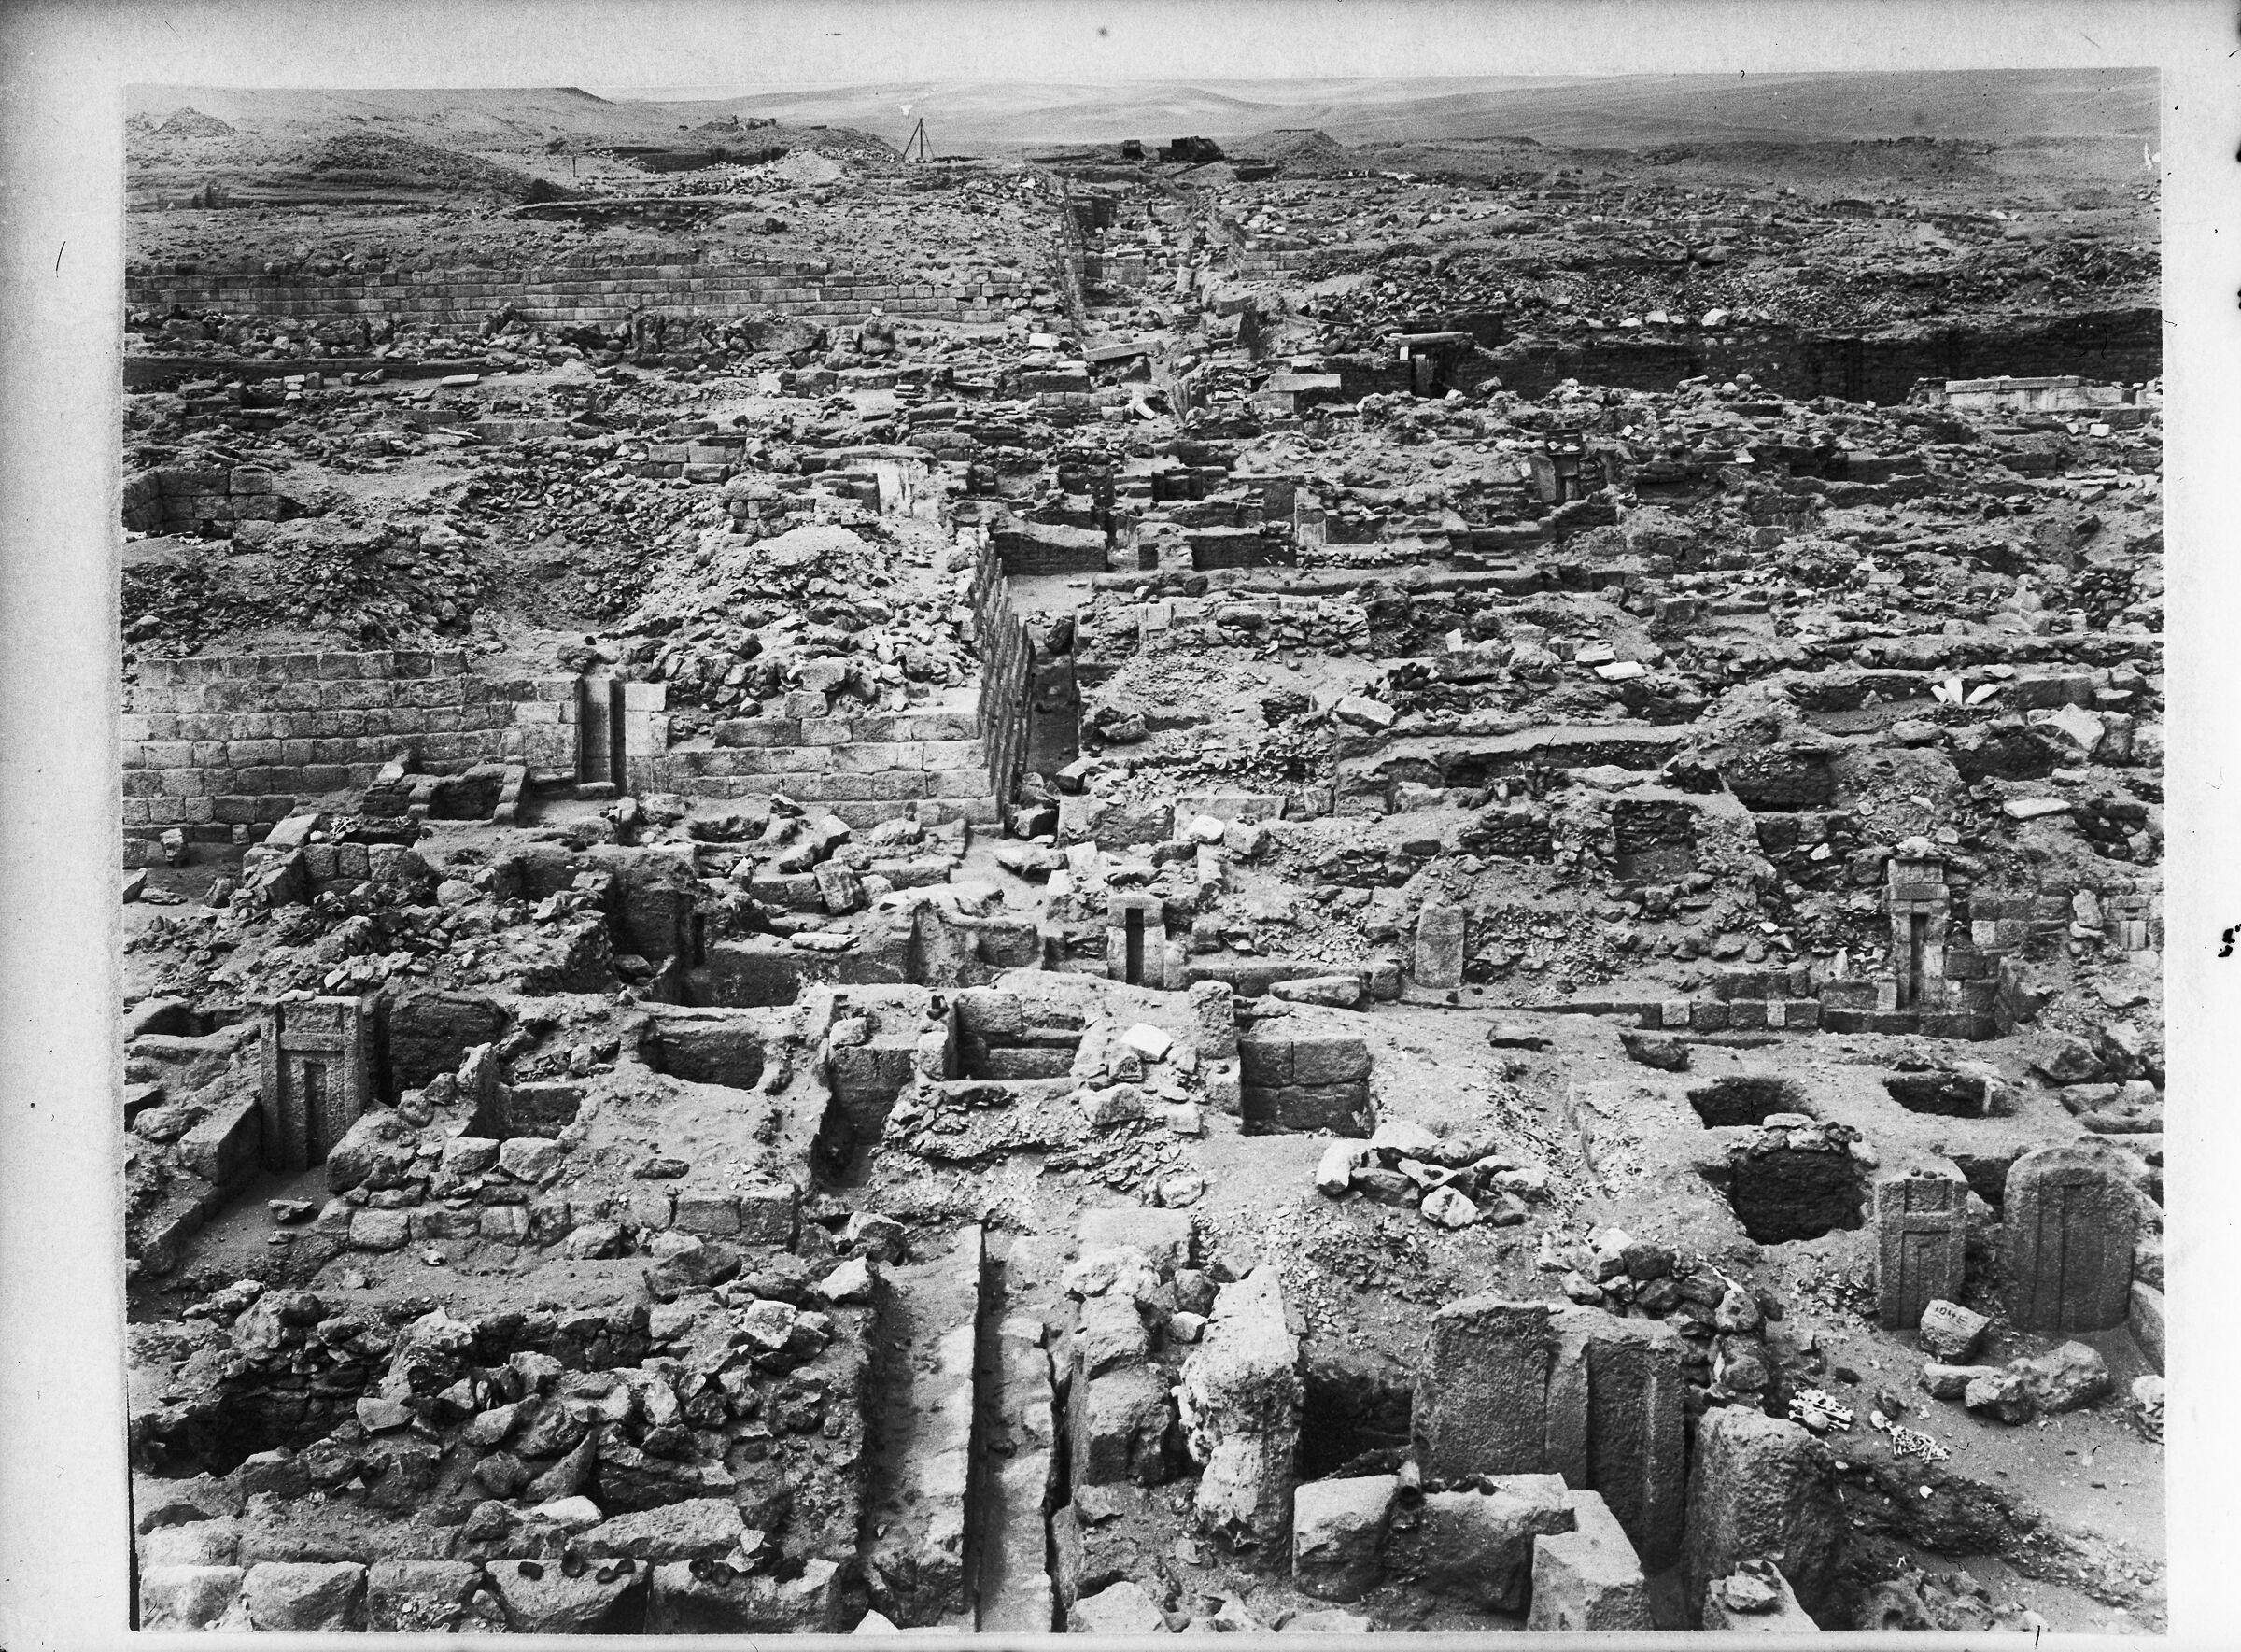 Western Cemetery: Site: Giza; View: G 1031, G 1044, G 1042, G 1043, G 1045+1046